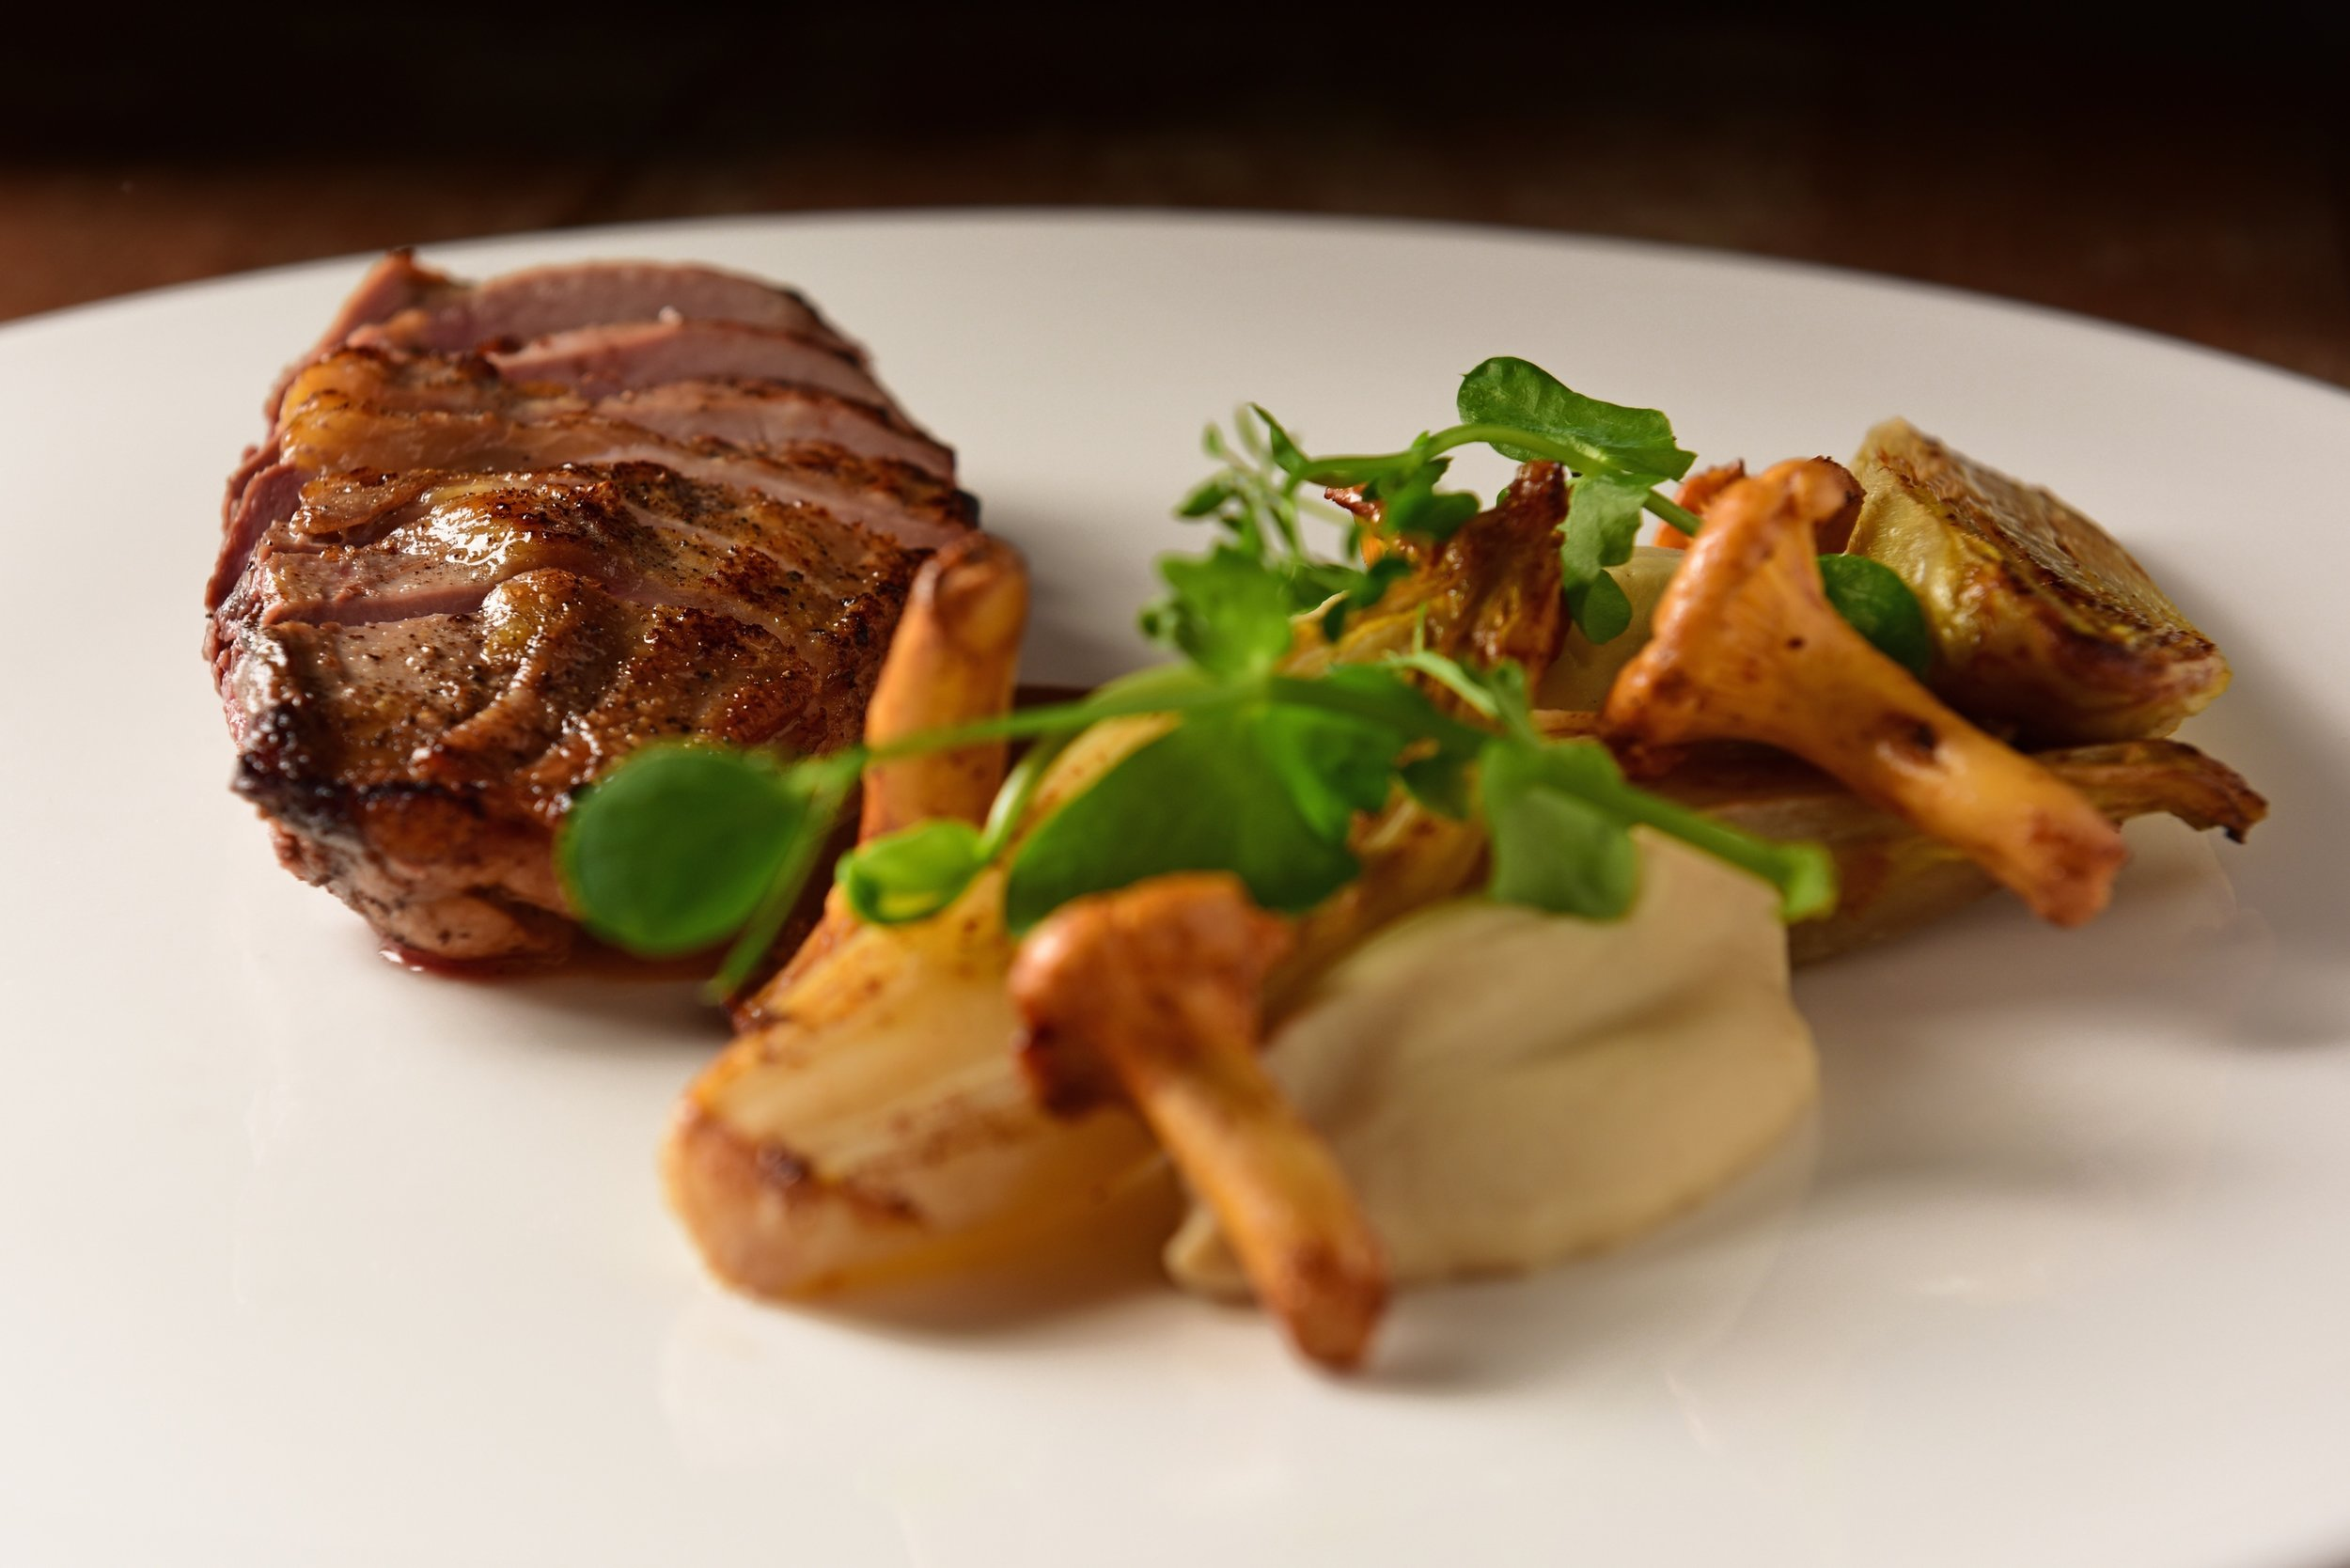 22 brasserie juste restaurant Dikkelvenne tablefever bart albrecht culinair fotograaf foodfotograaf.jpg